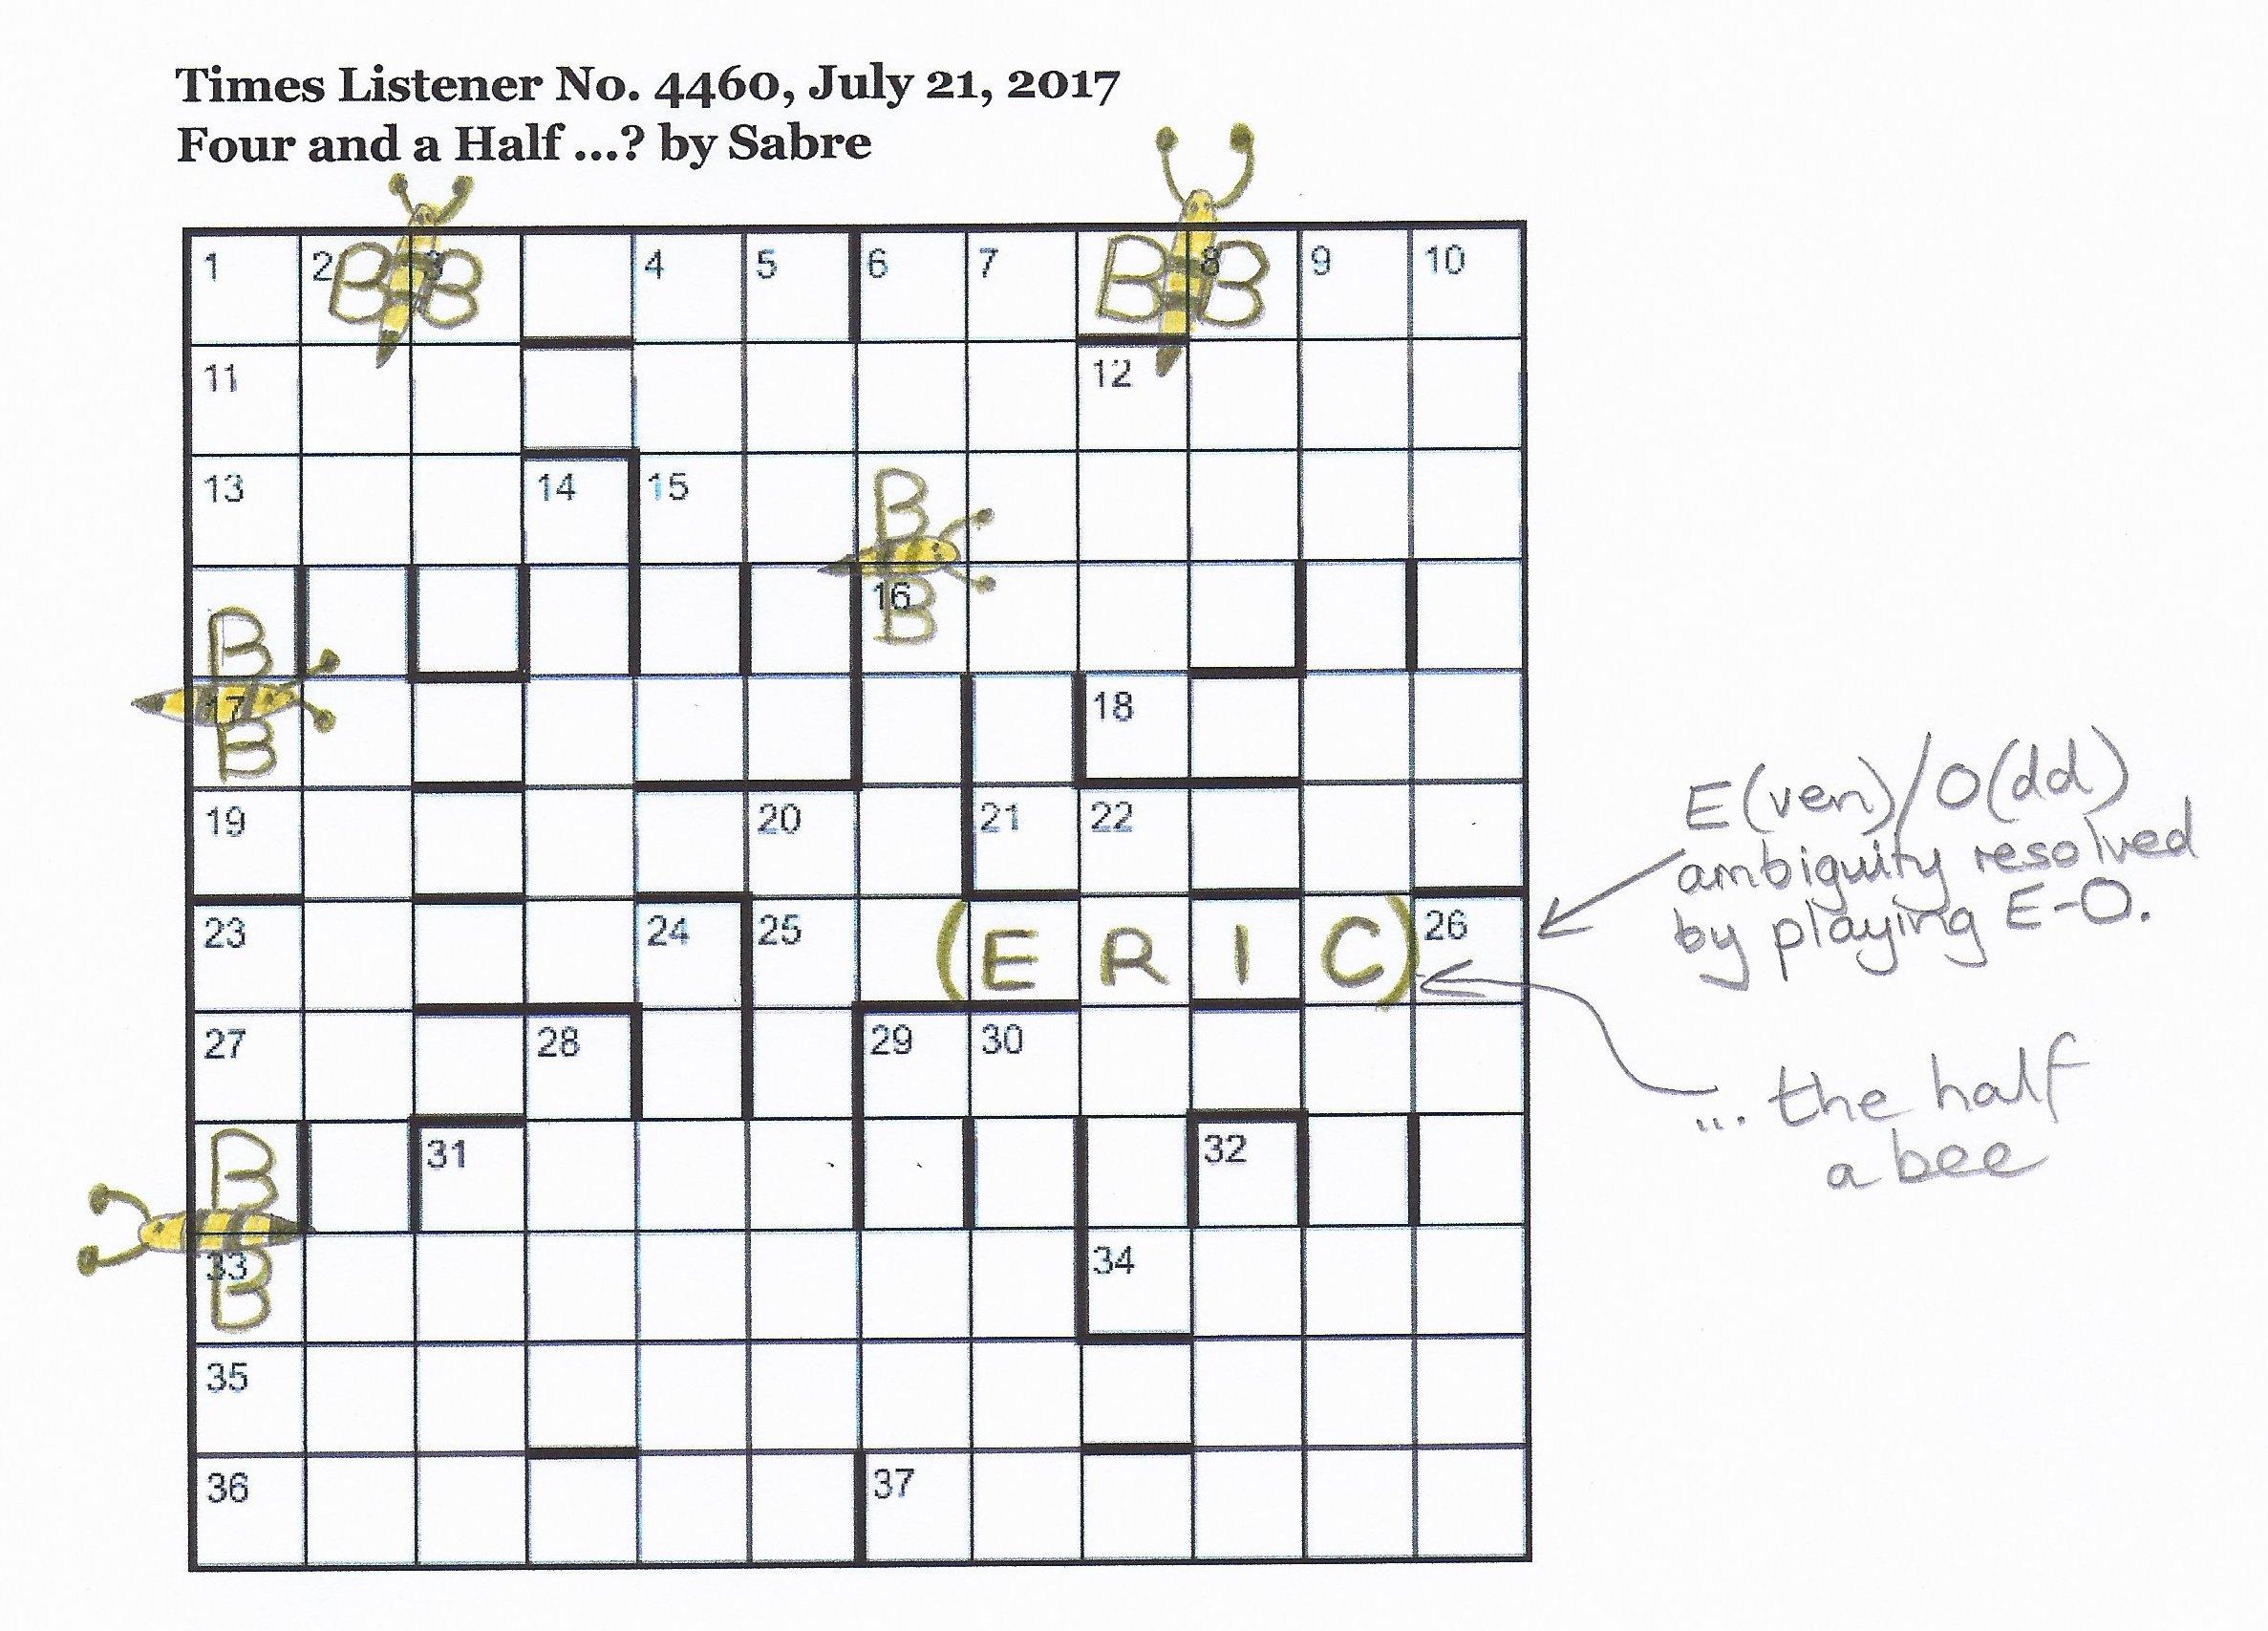 2017-07-23 13.54.06